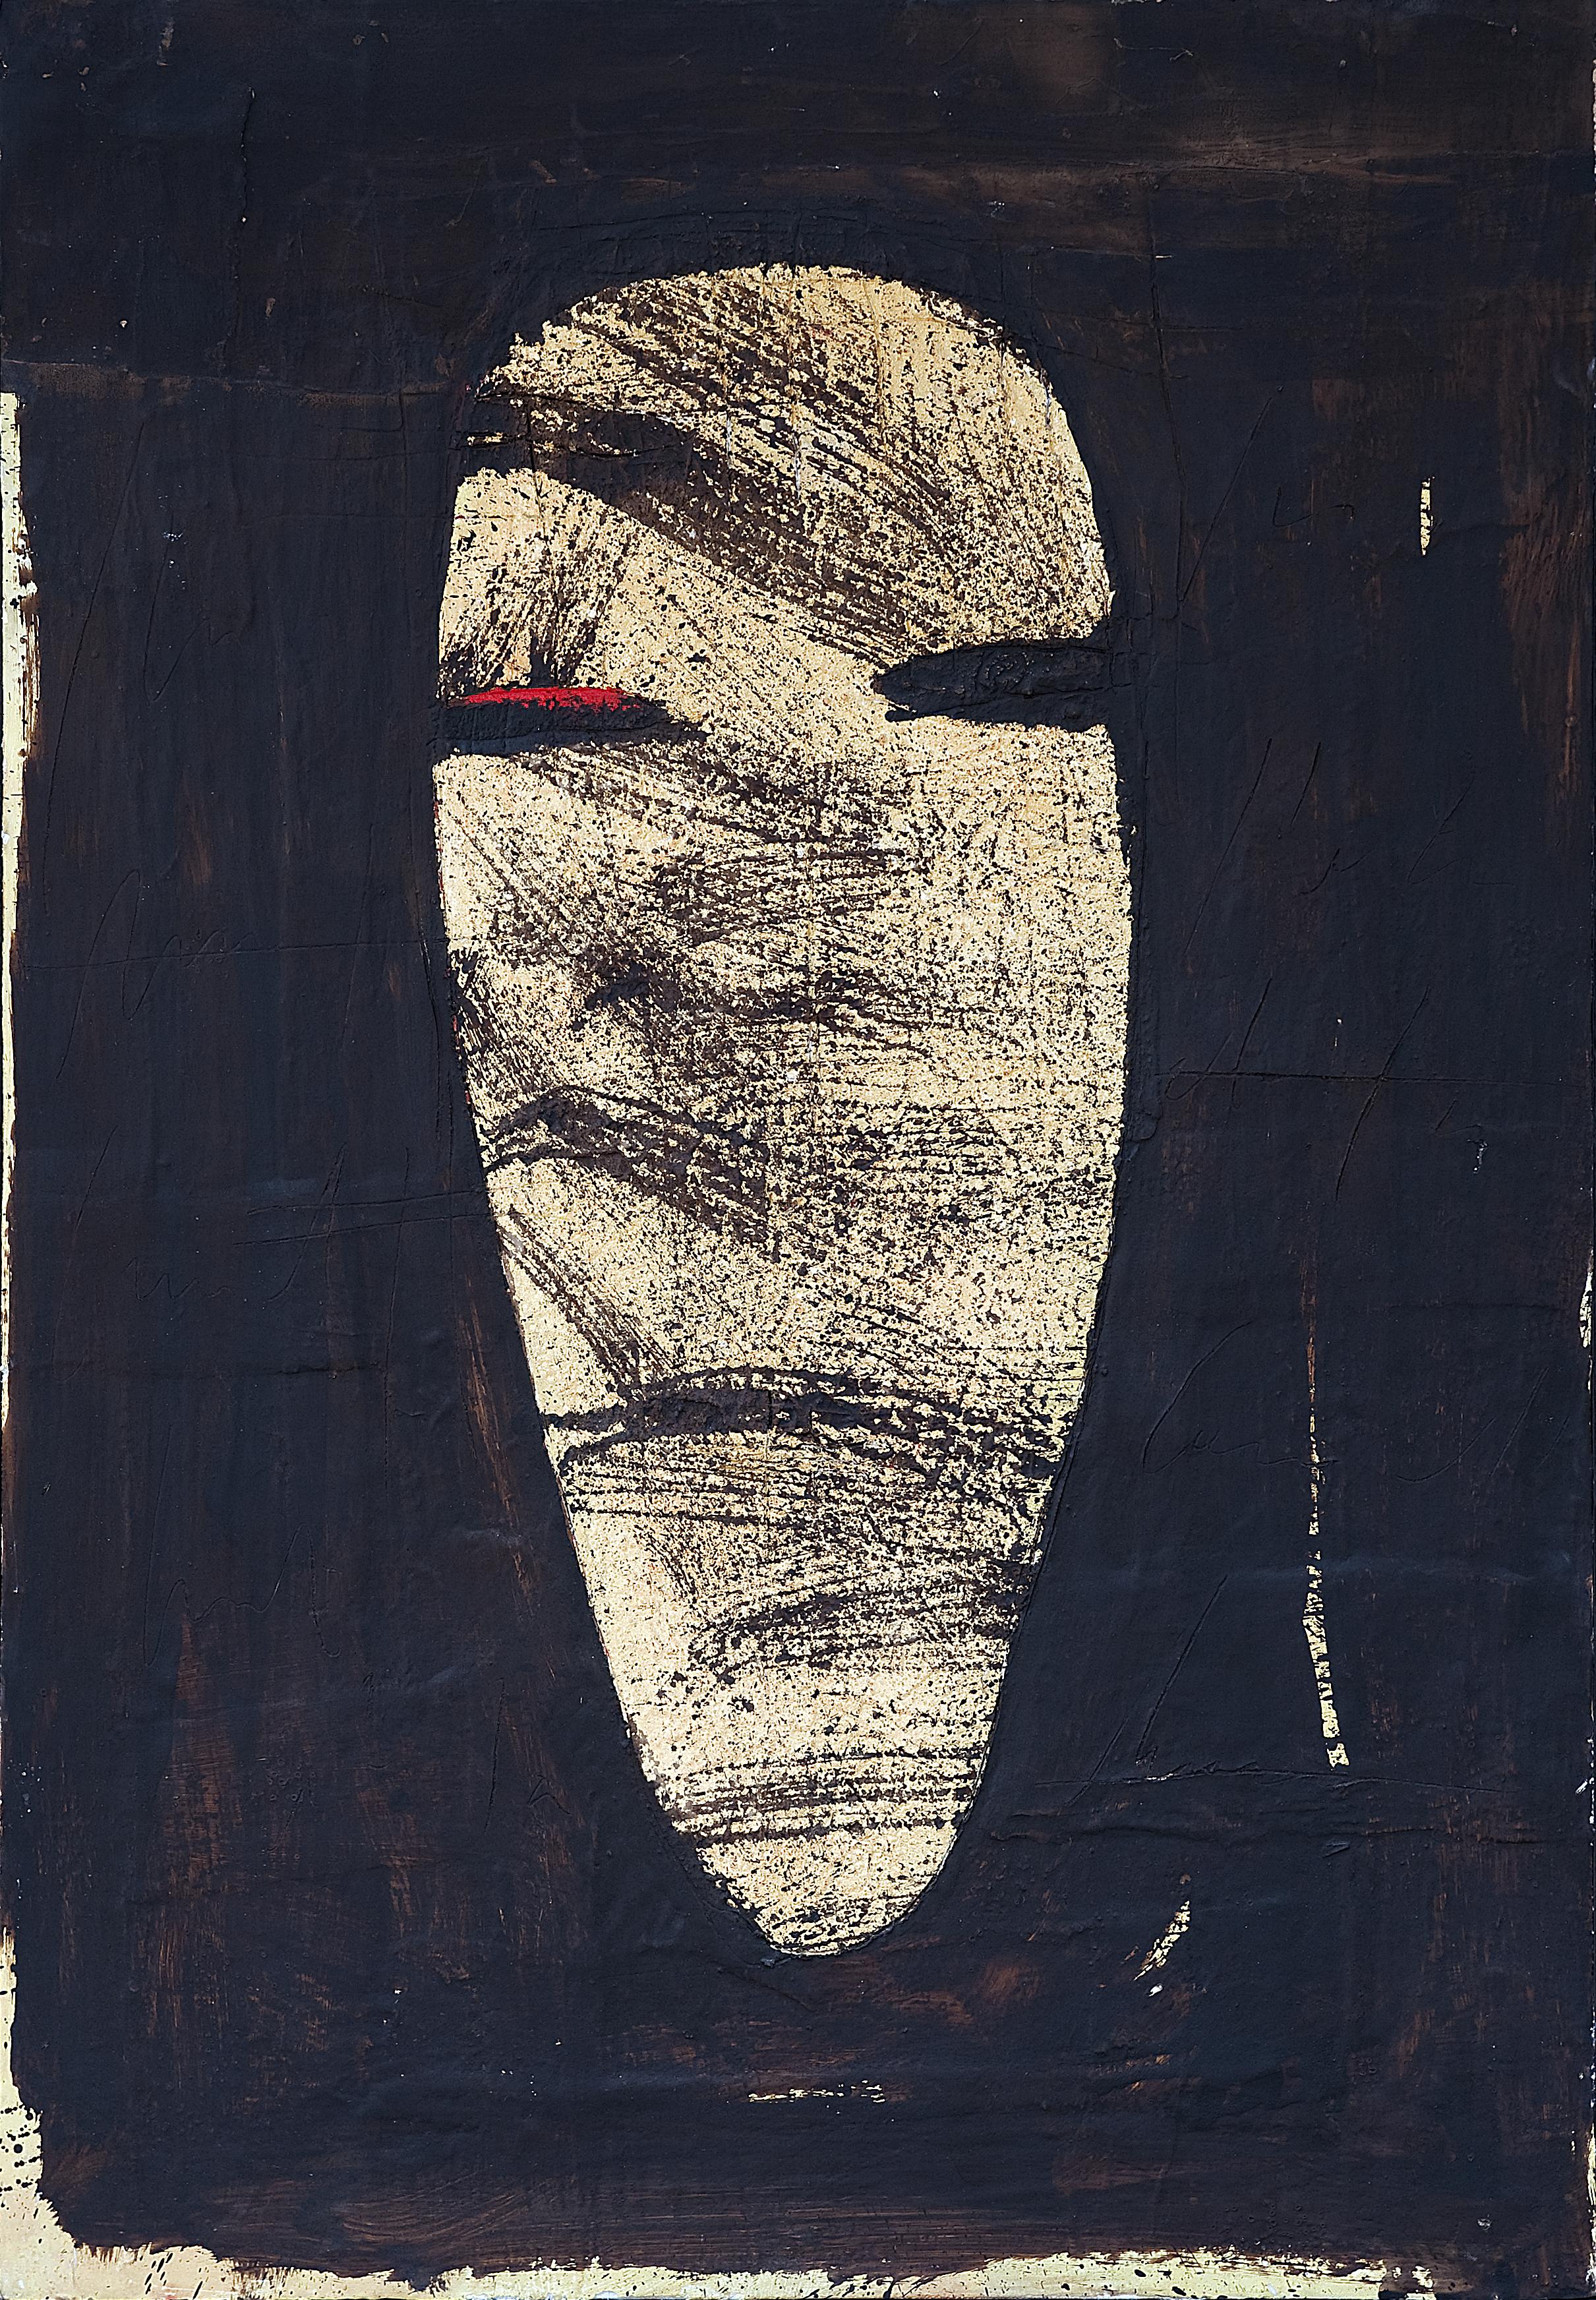 Masque - Mahibinebine